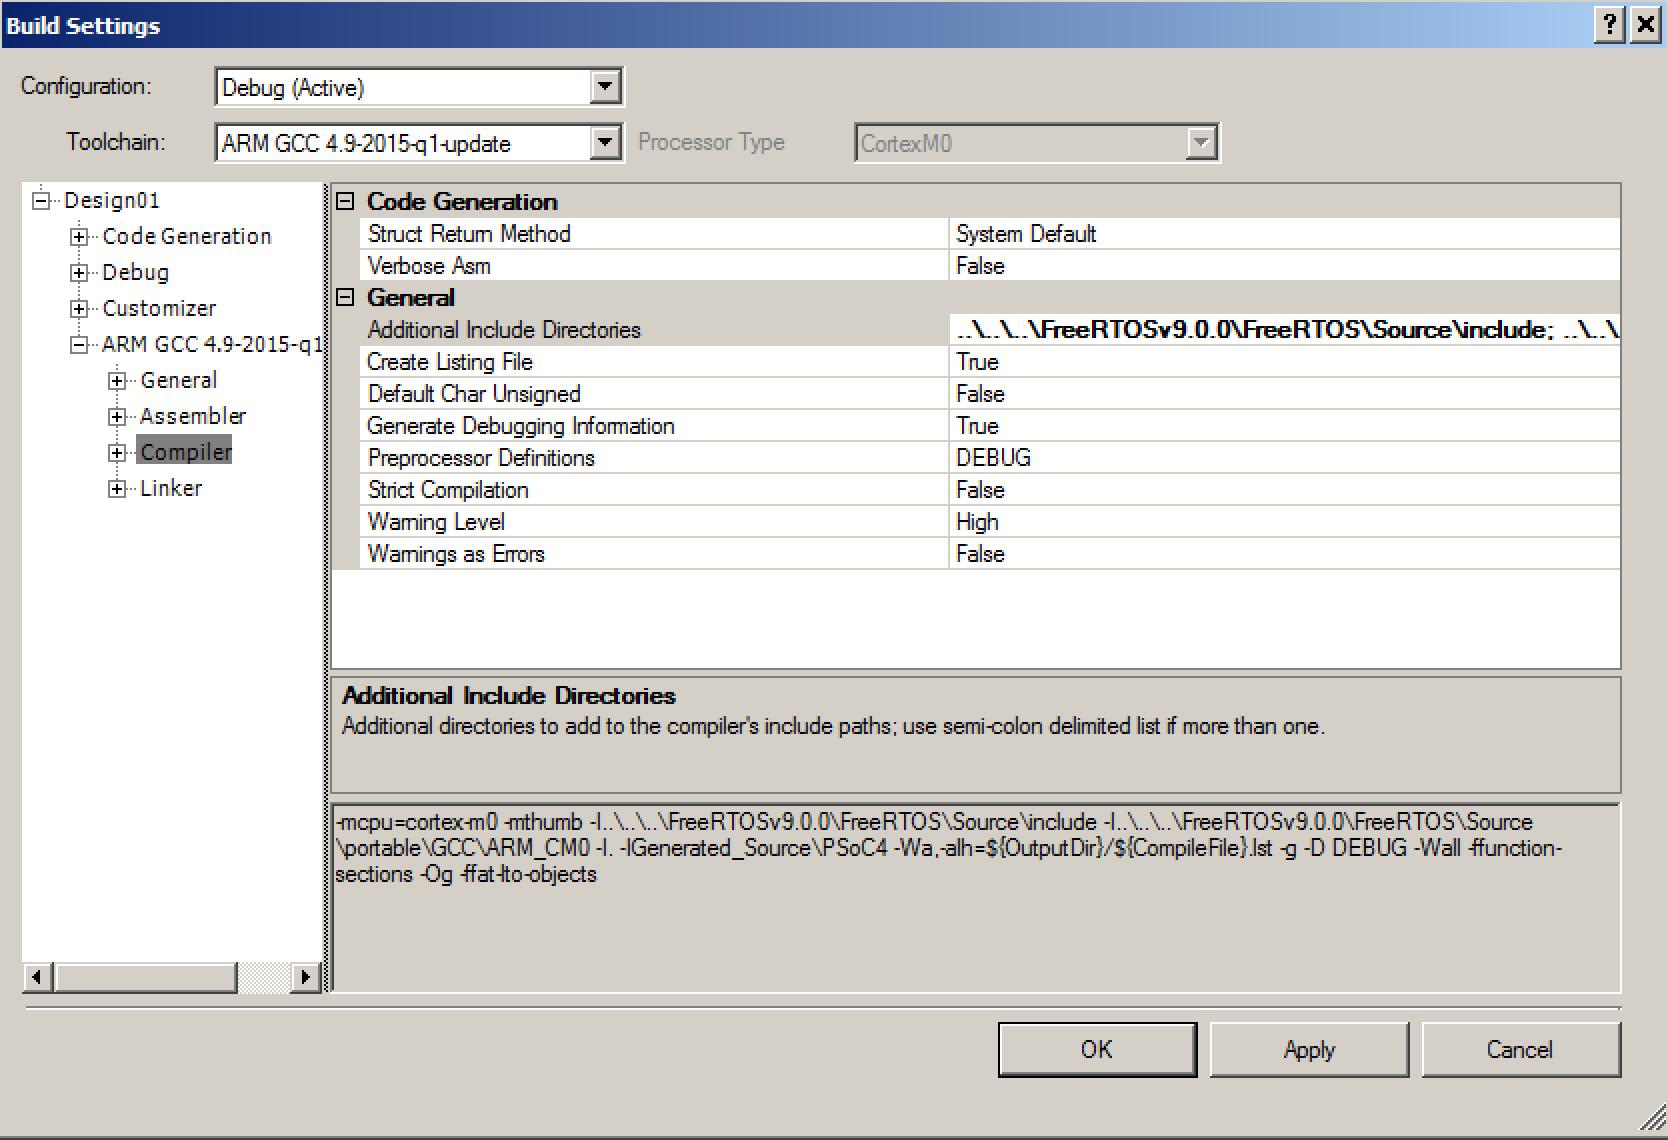 Configuring the PSoC 4 FreeRTOS build settings